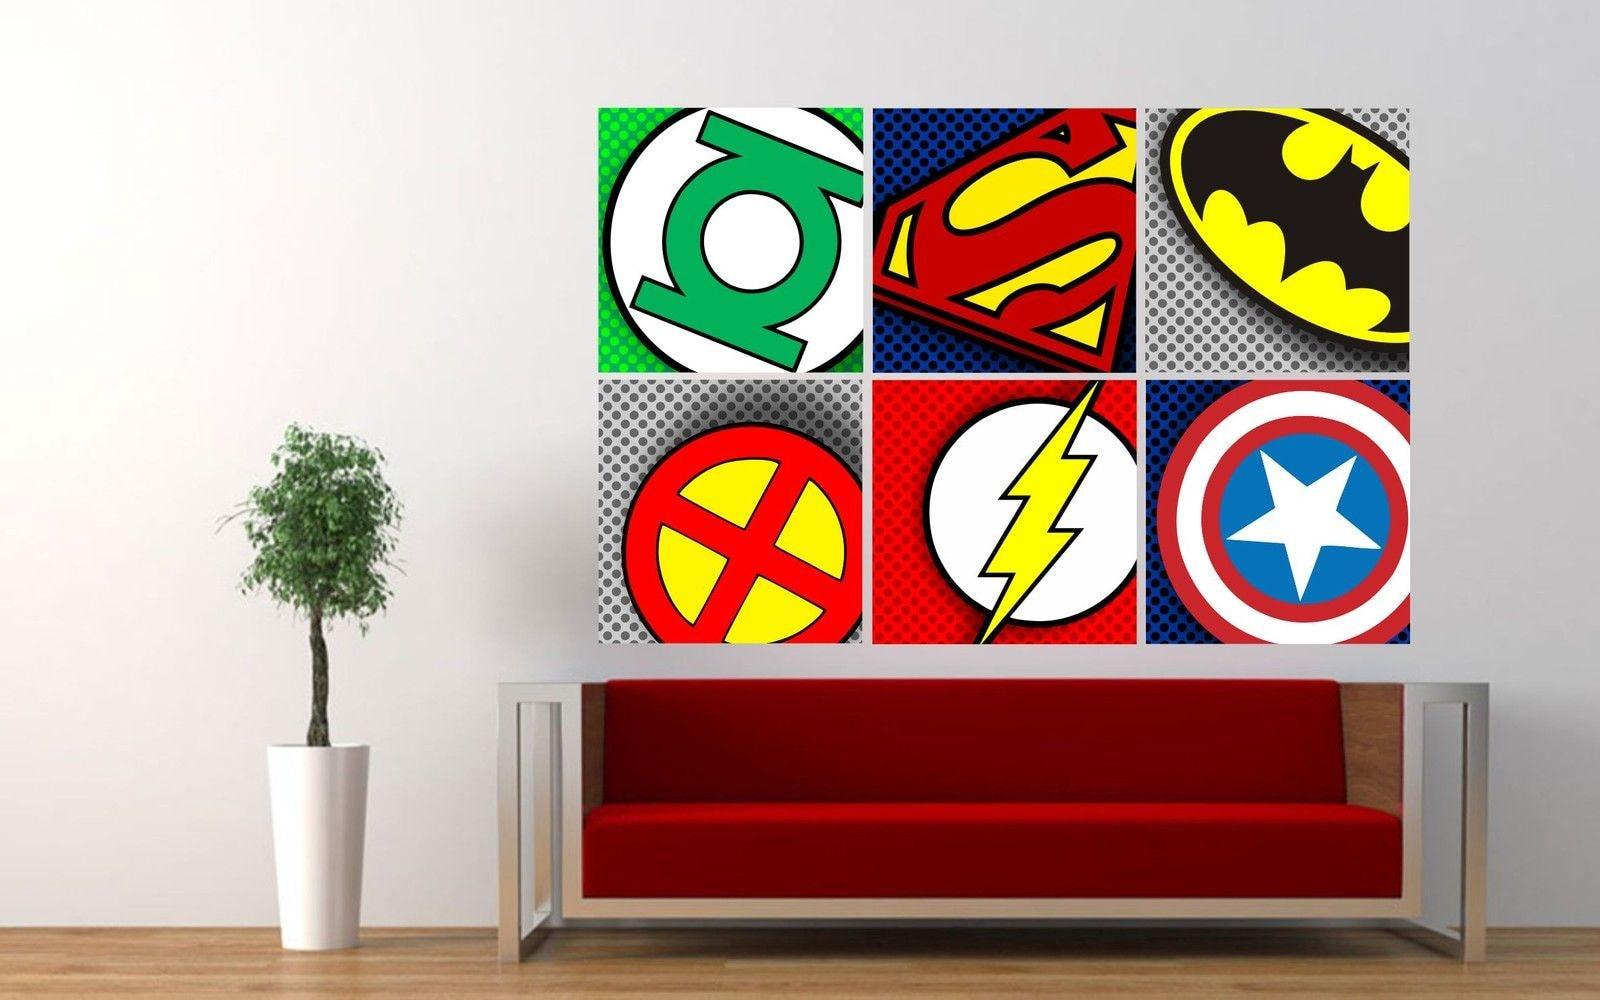 Superhero logos pop art badges wall sticker boys bedroom decal zoom amipublicfo Choice Image